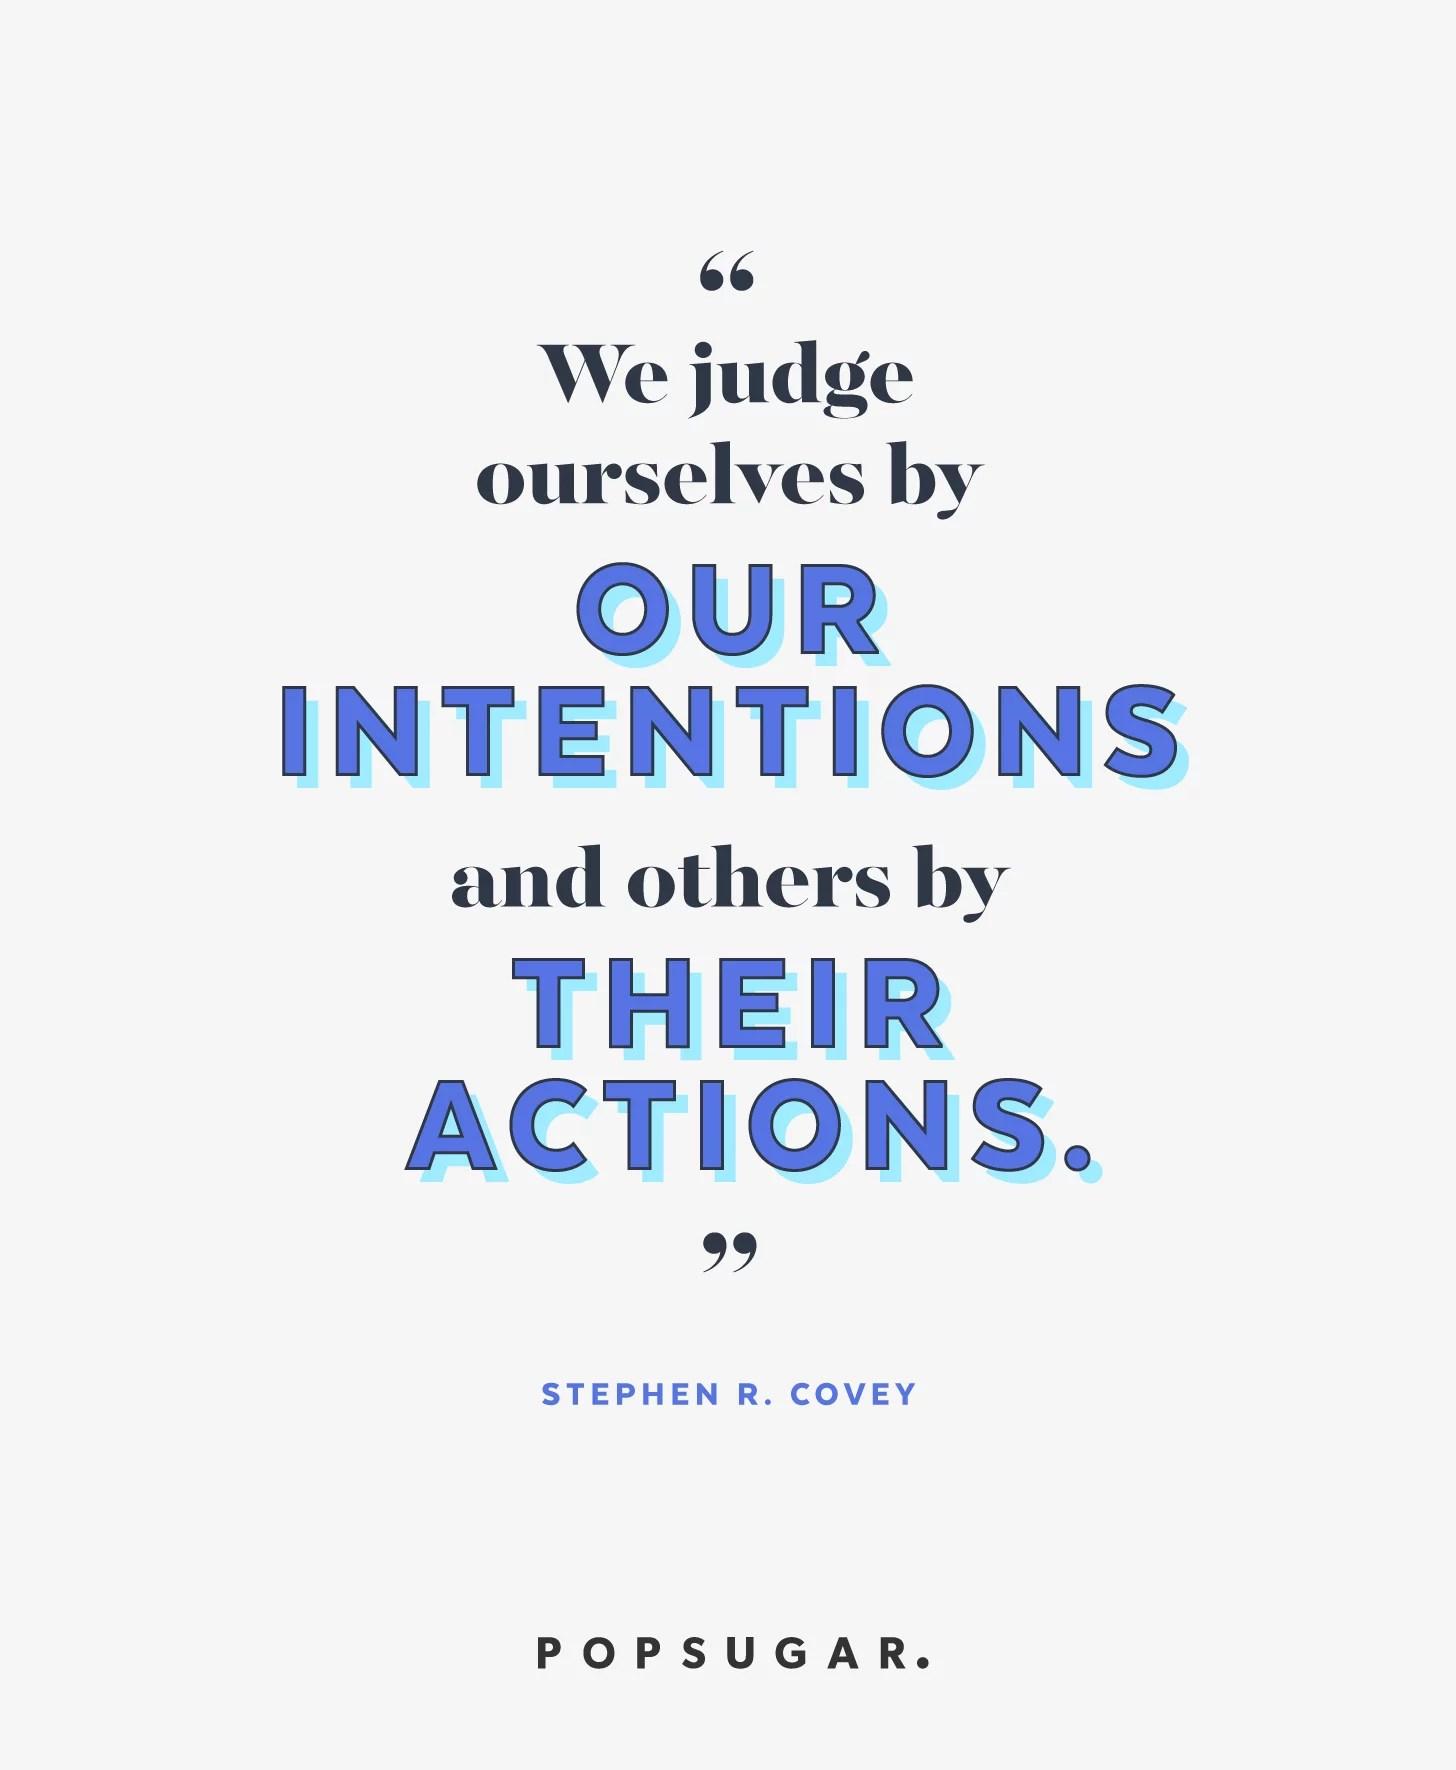 Don't Judge People Quotes : don't, judge, people, quotes, Don't, Judge, Powerful, Quotes, Might, Inspire, Great, Things, POPSUGAR, Smart, Living, Photo